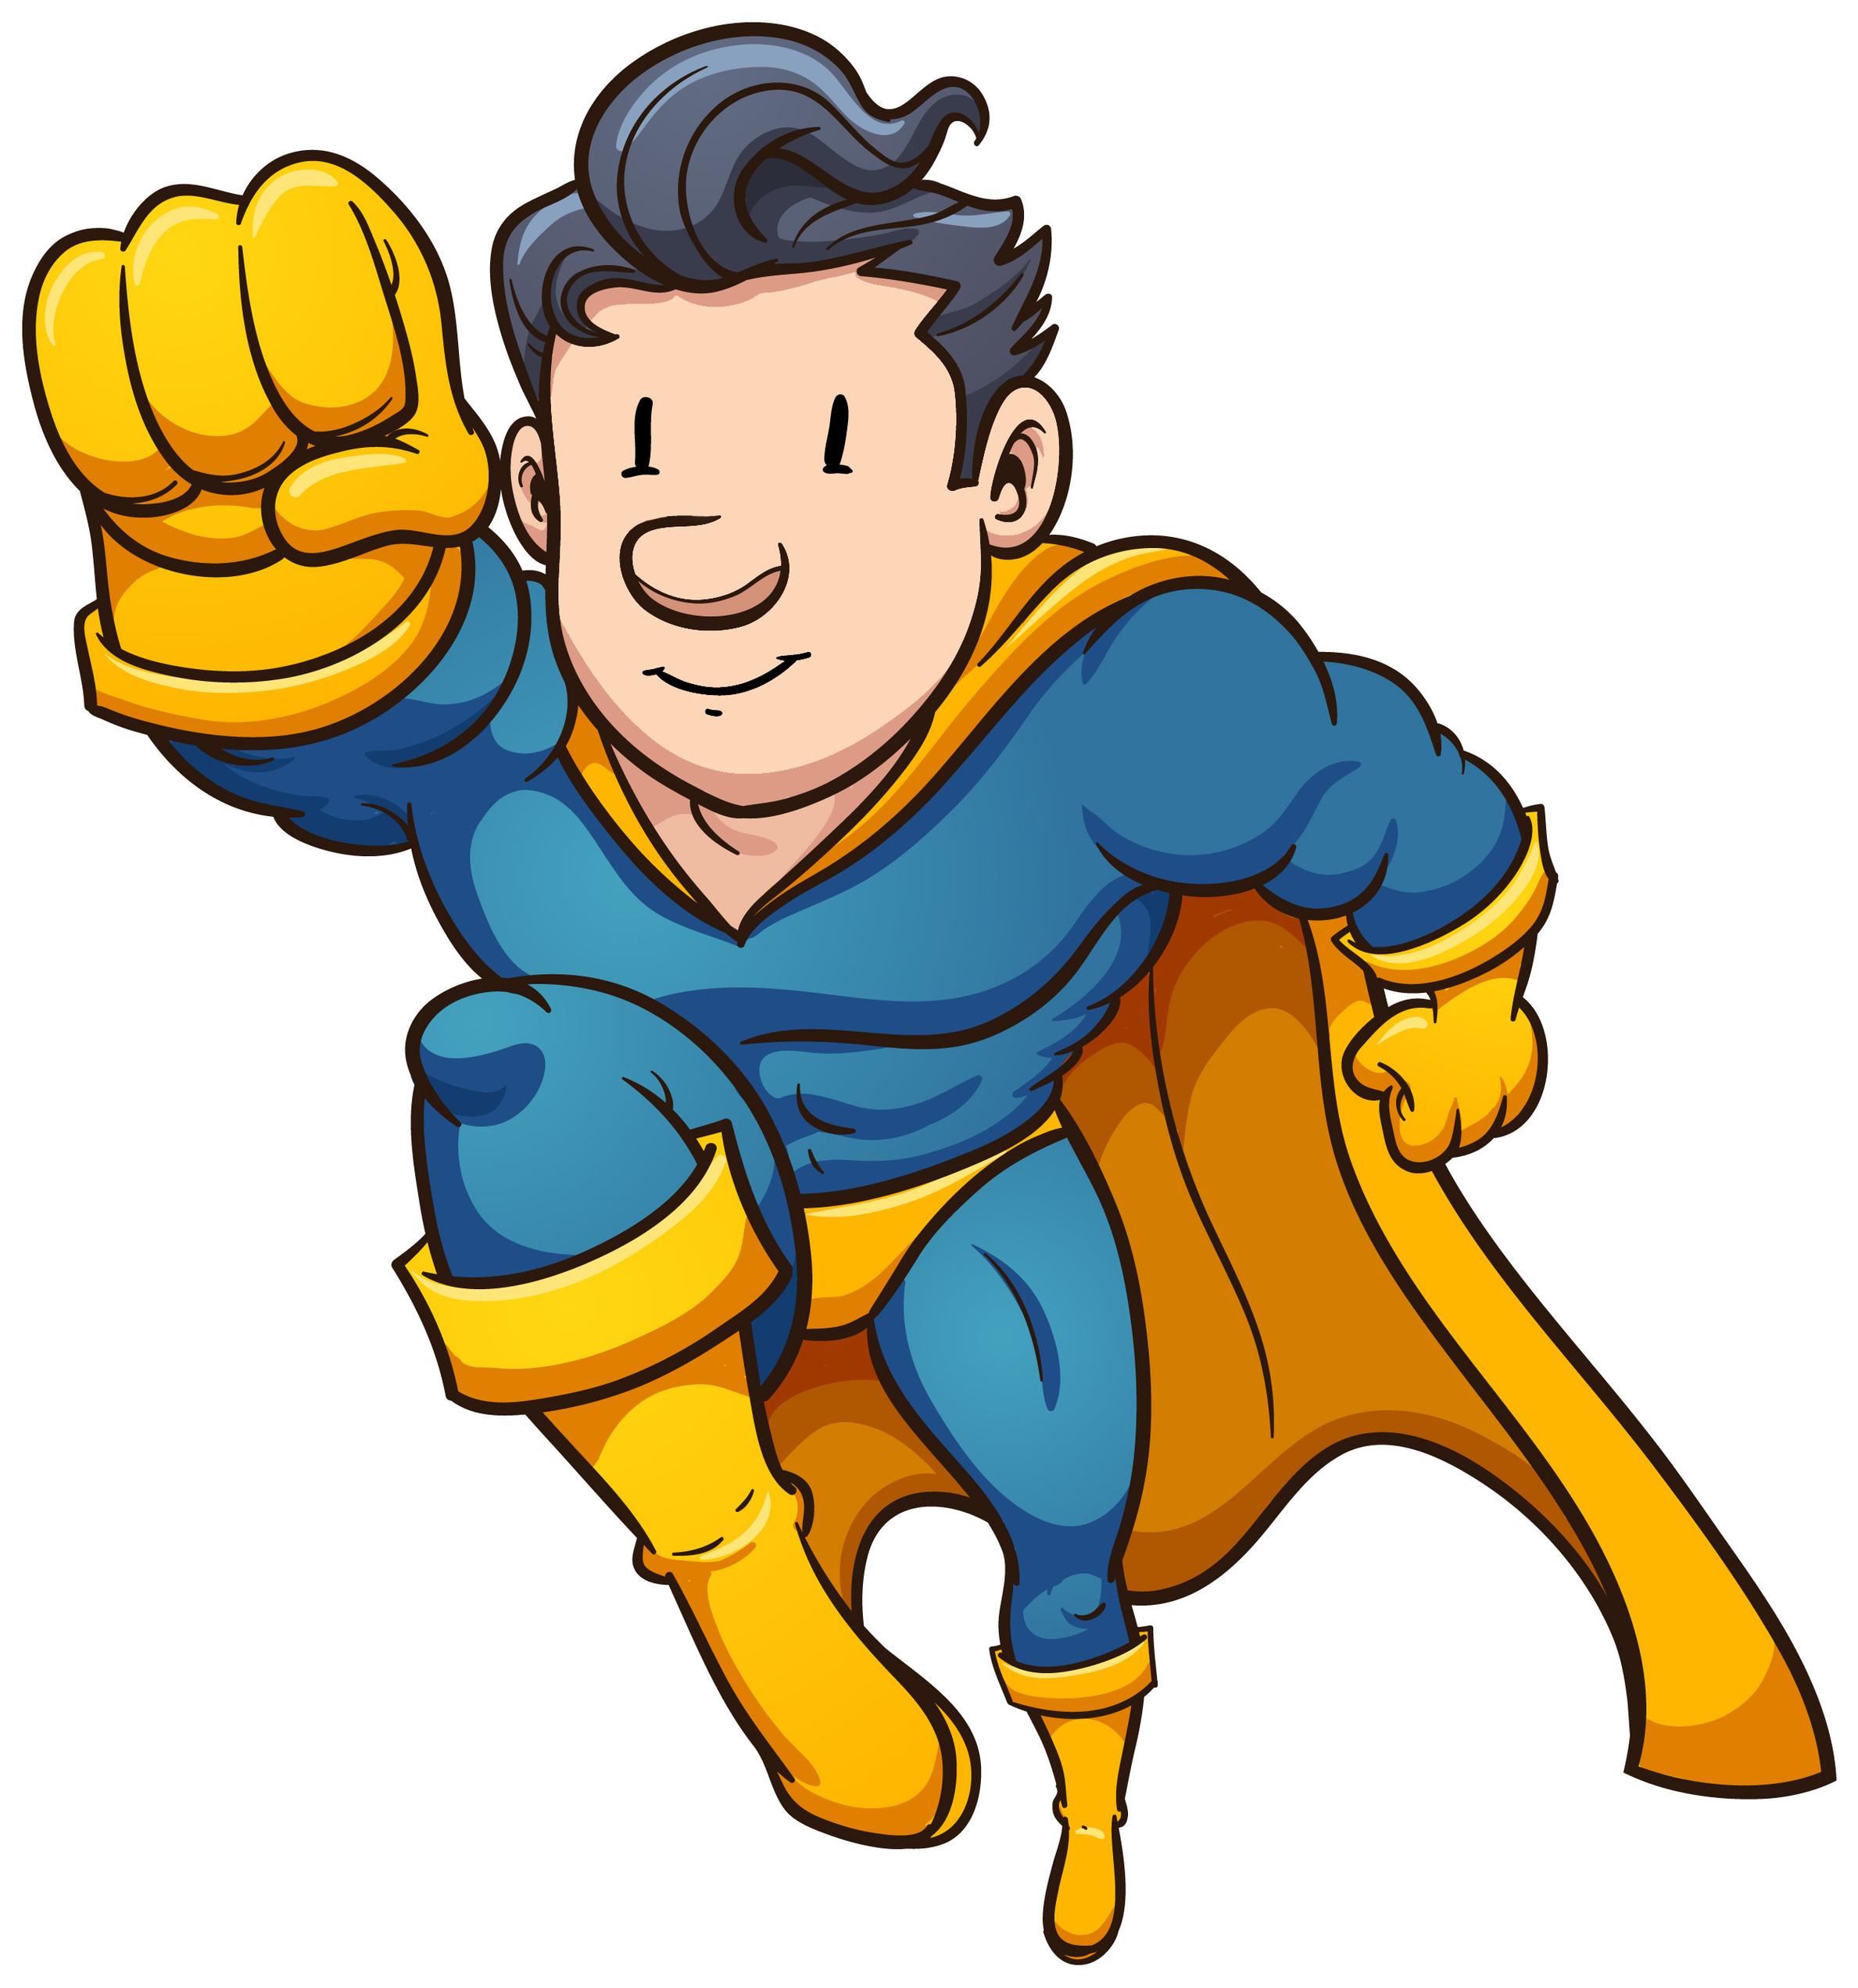 Superheroes clipart generic. Superhero clip art library